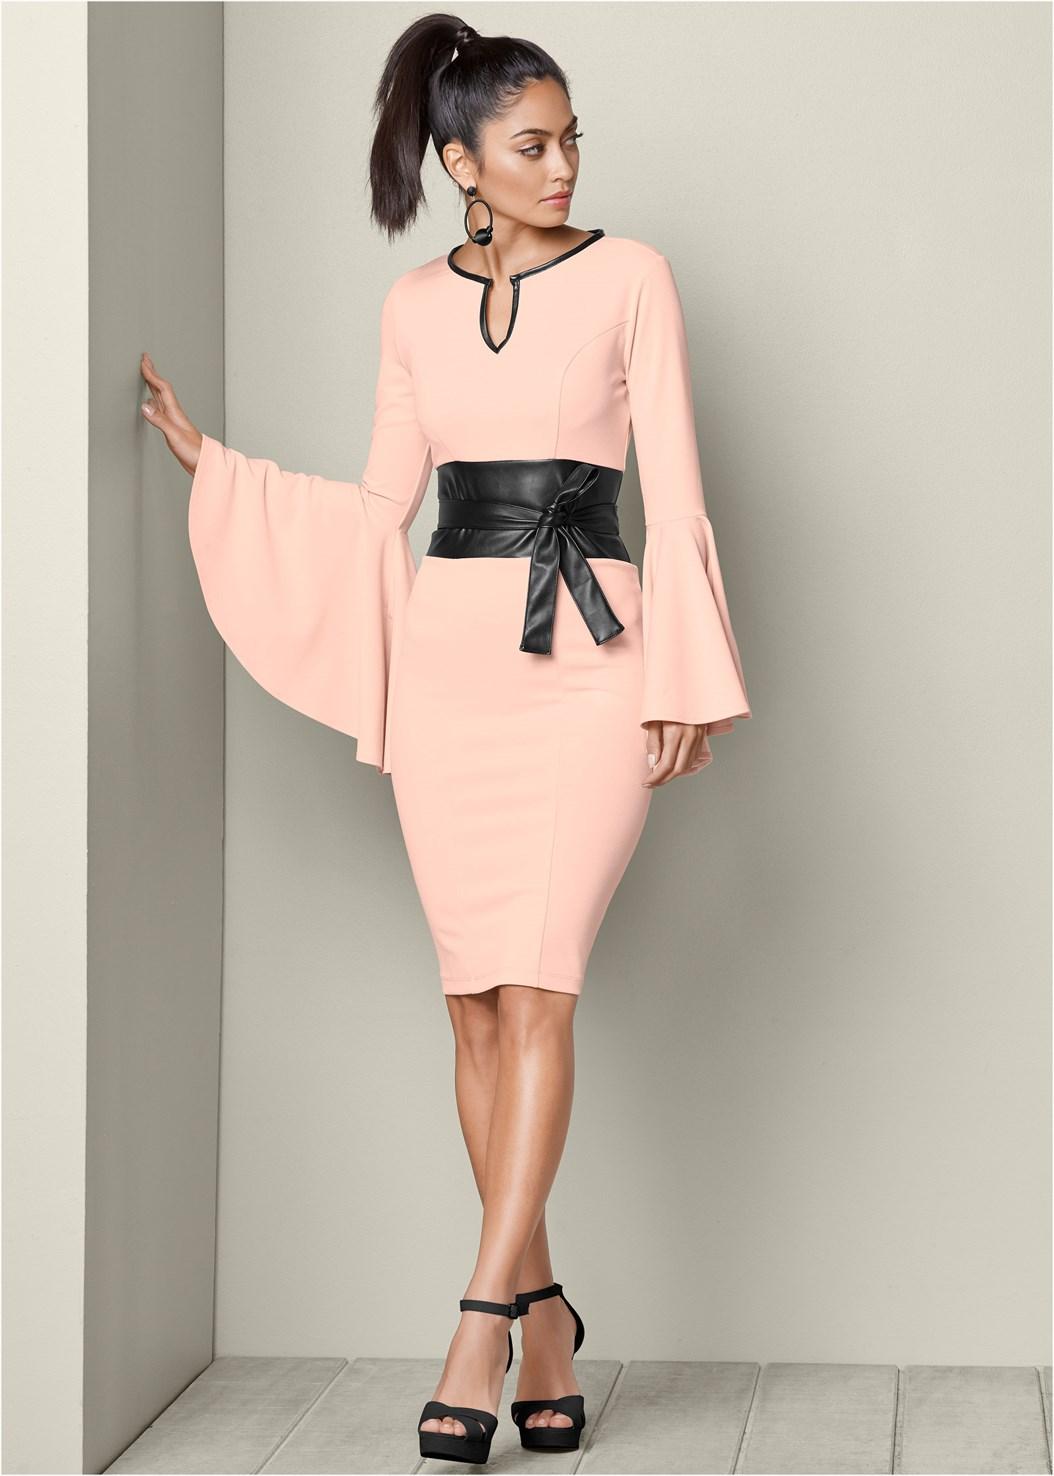 Sleeve Detail Belted Dress,Confidence Seamless Dress,Bauble Hoop Earrings